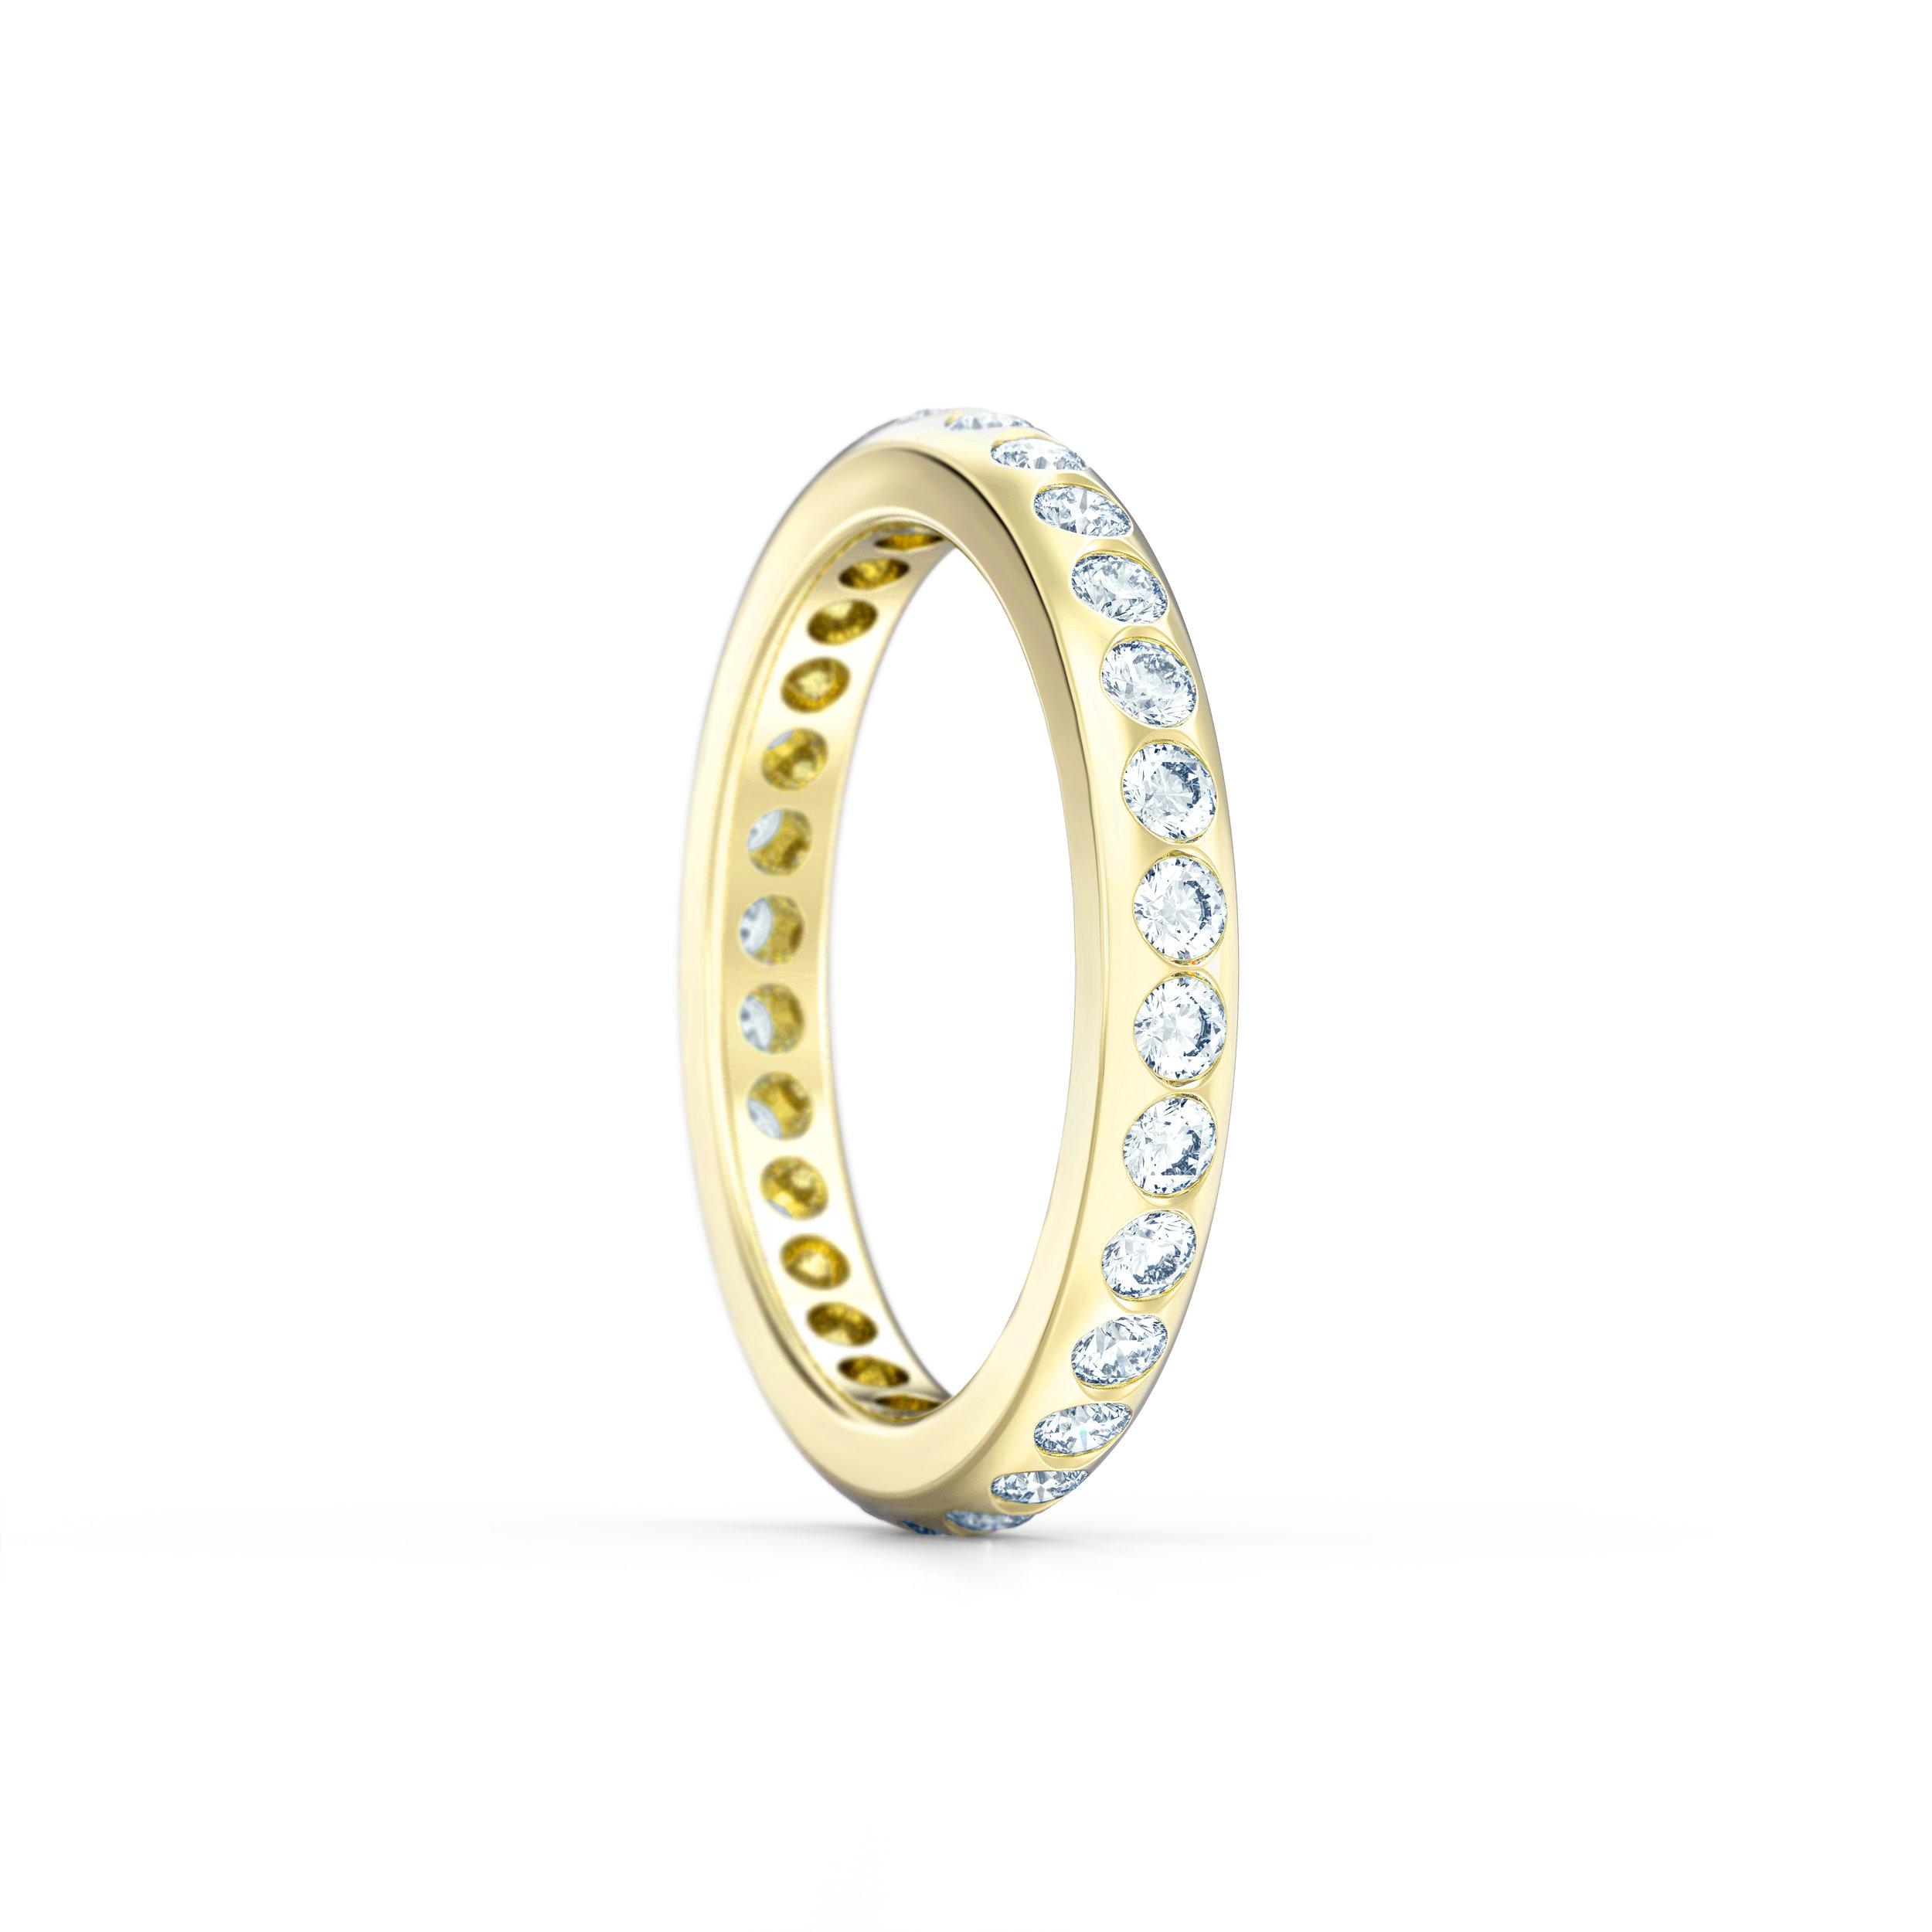 Gypsy Set Rub Over Eternity Ring | Hatton Garden Jewellers